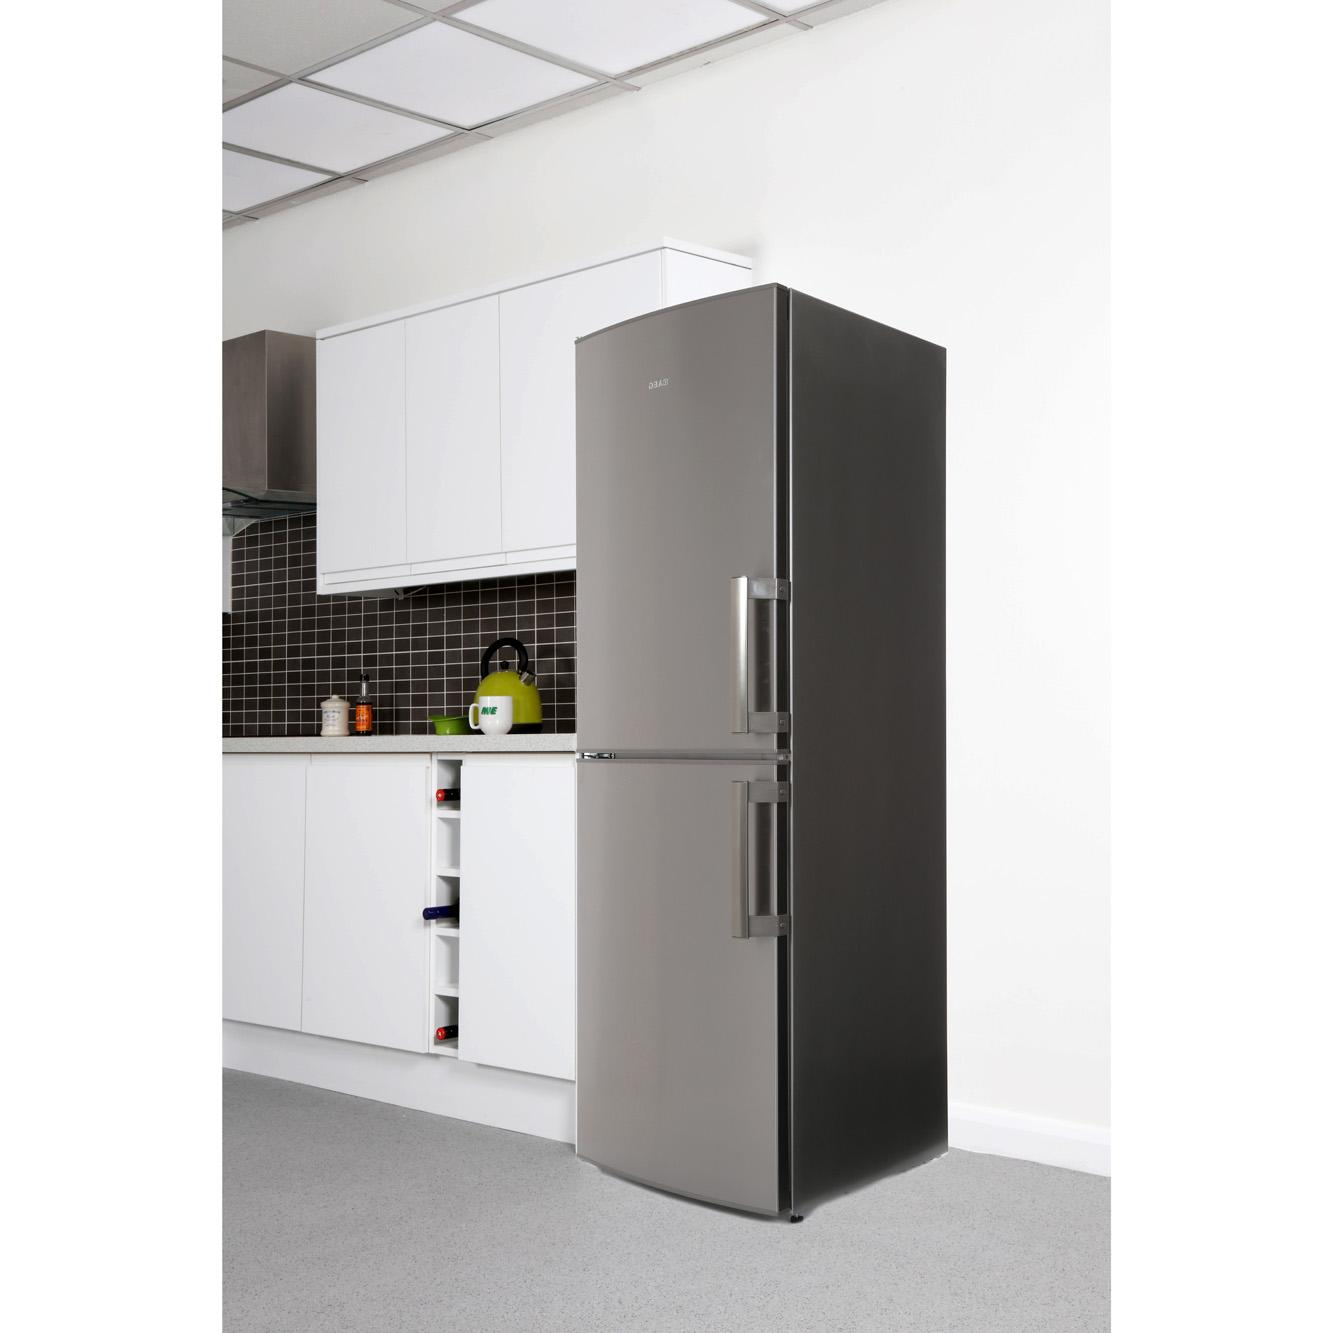 Buy Aeg S53520ctx2 Fridge Freezer Stainless Steel